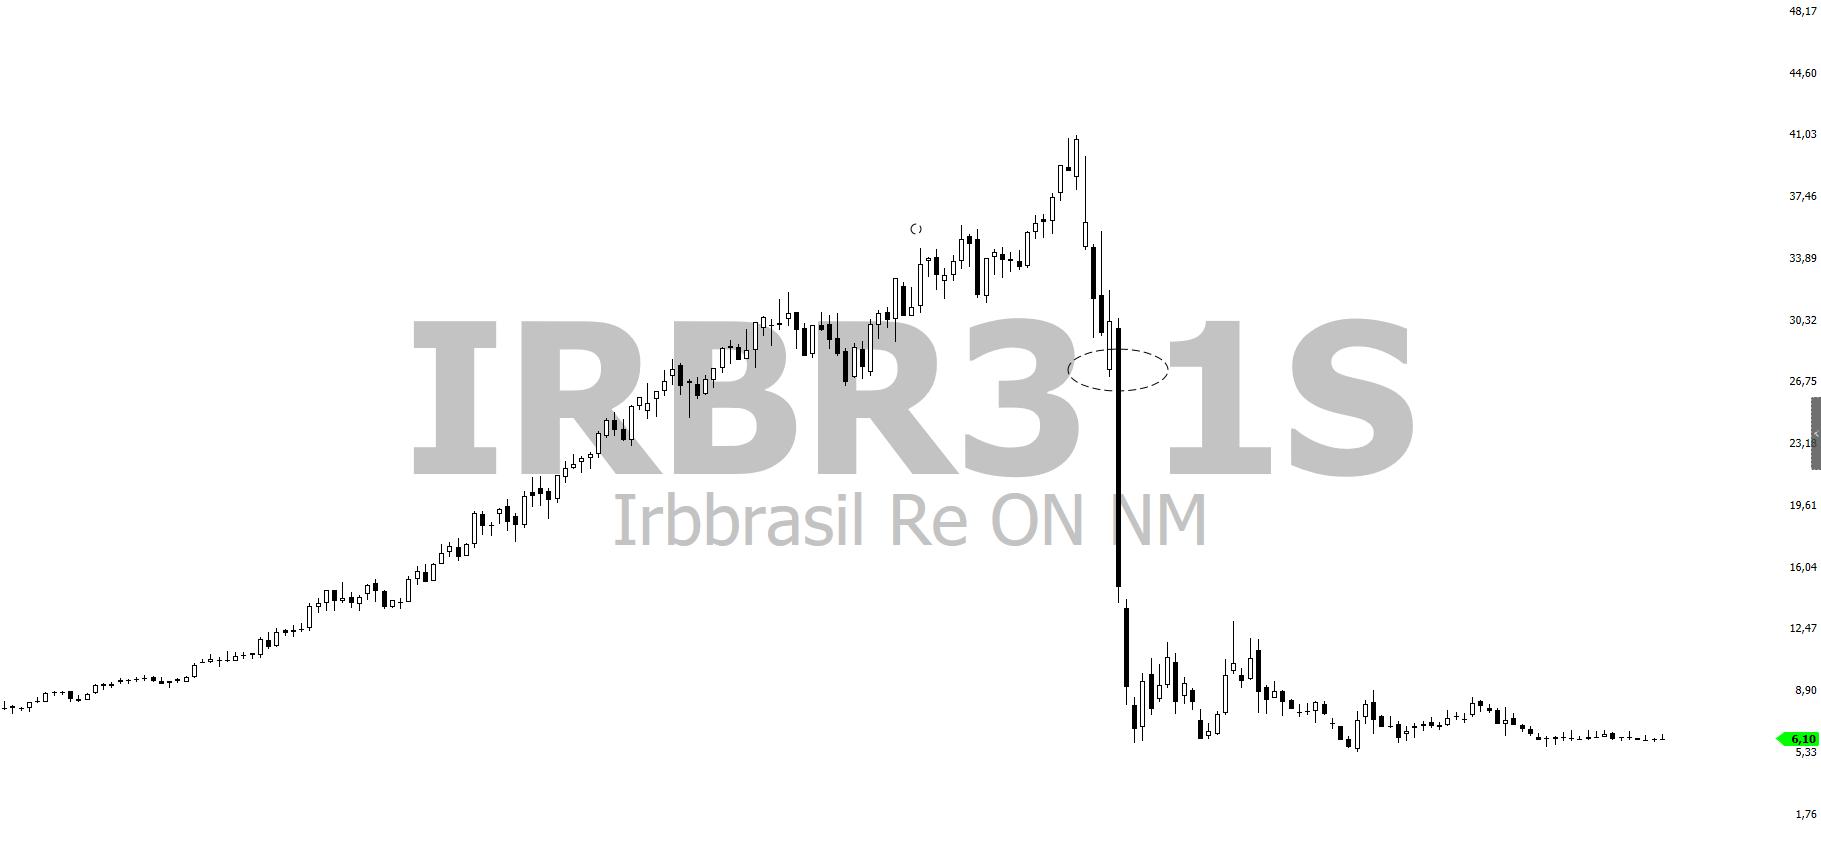 grafico diario irbr3